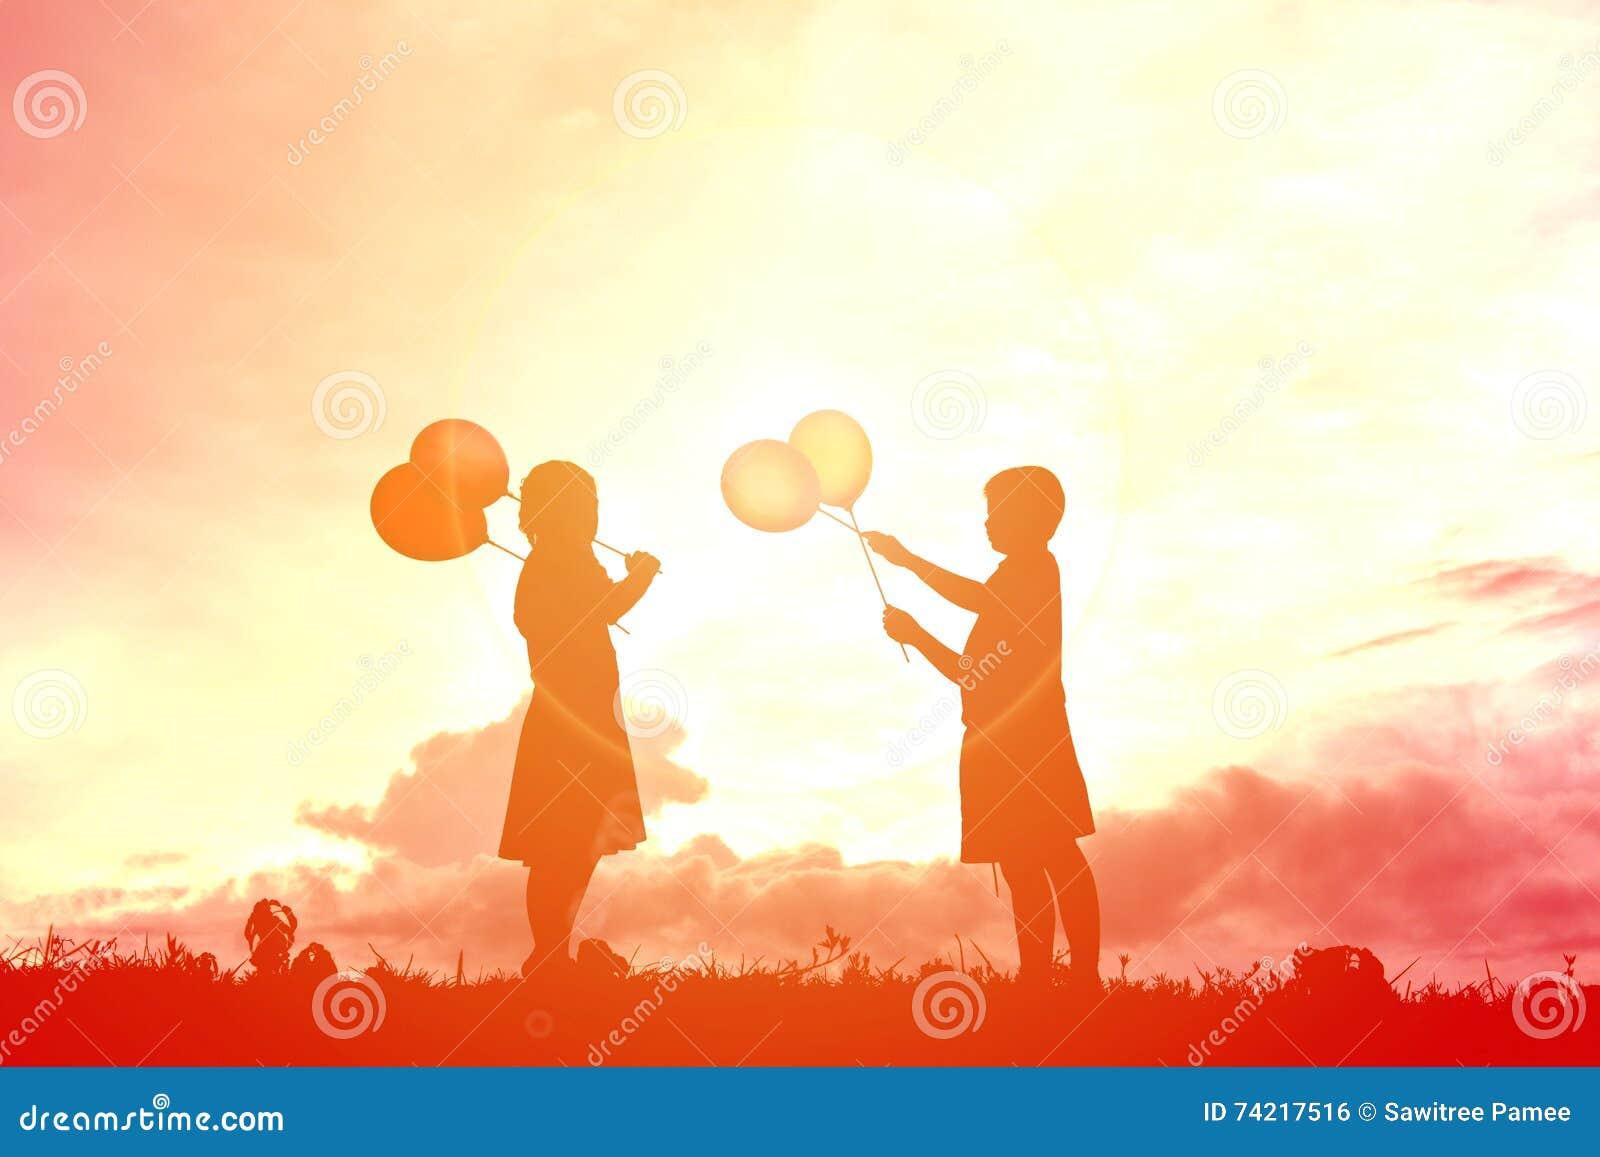 Silhouette children with balloon